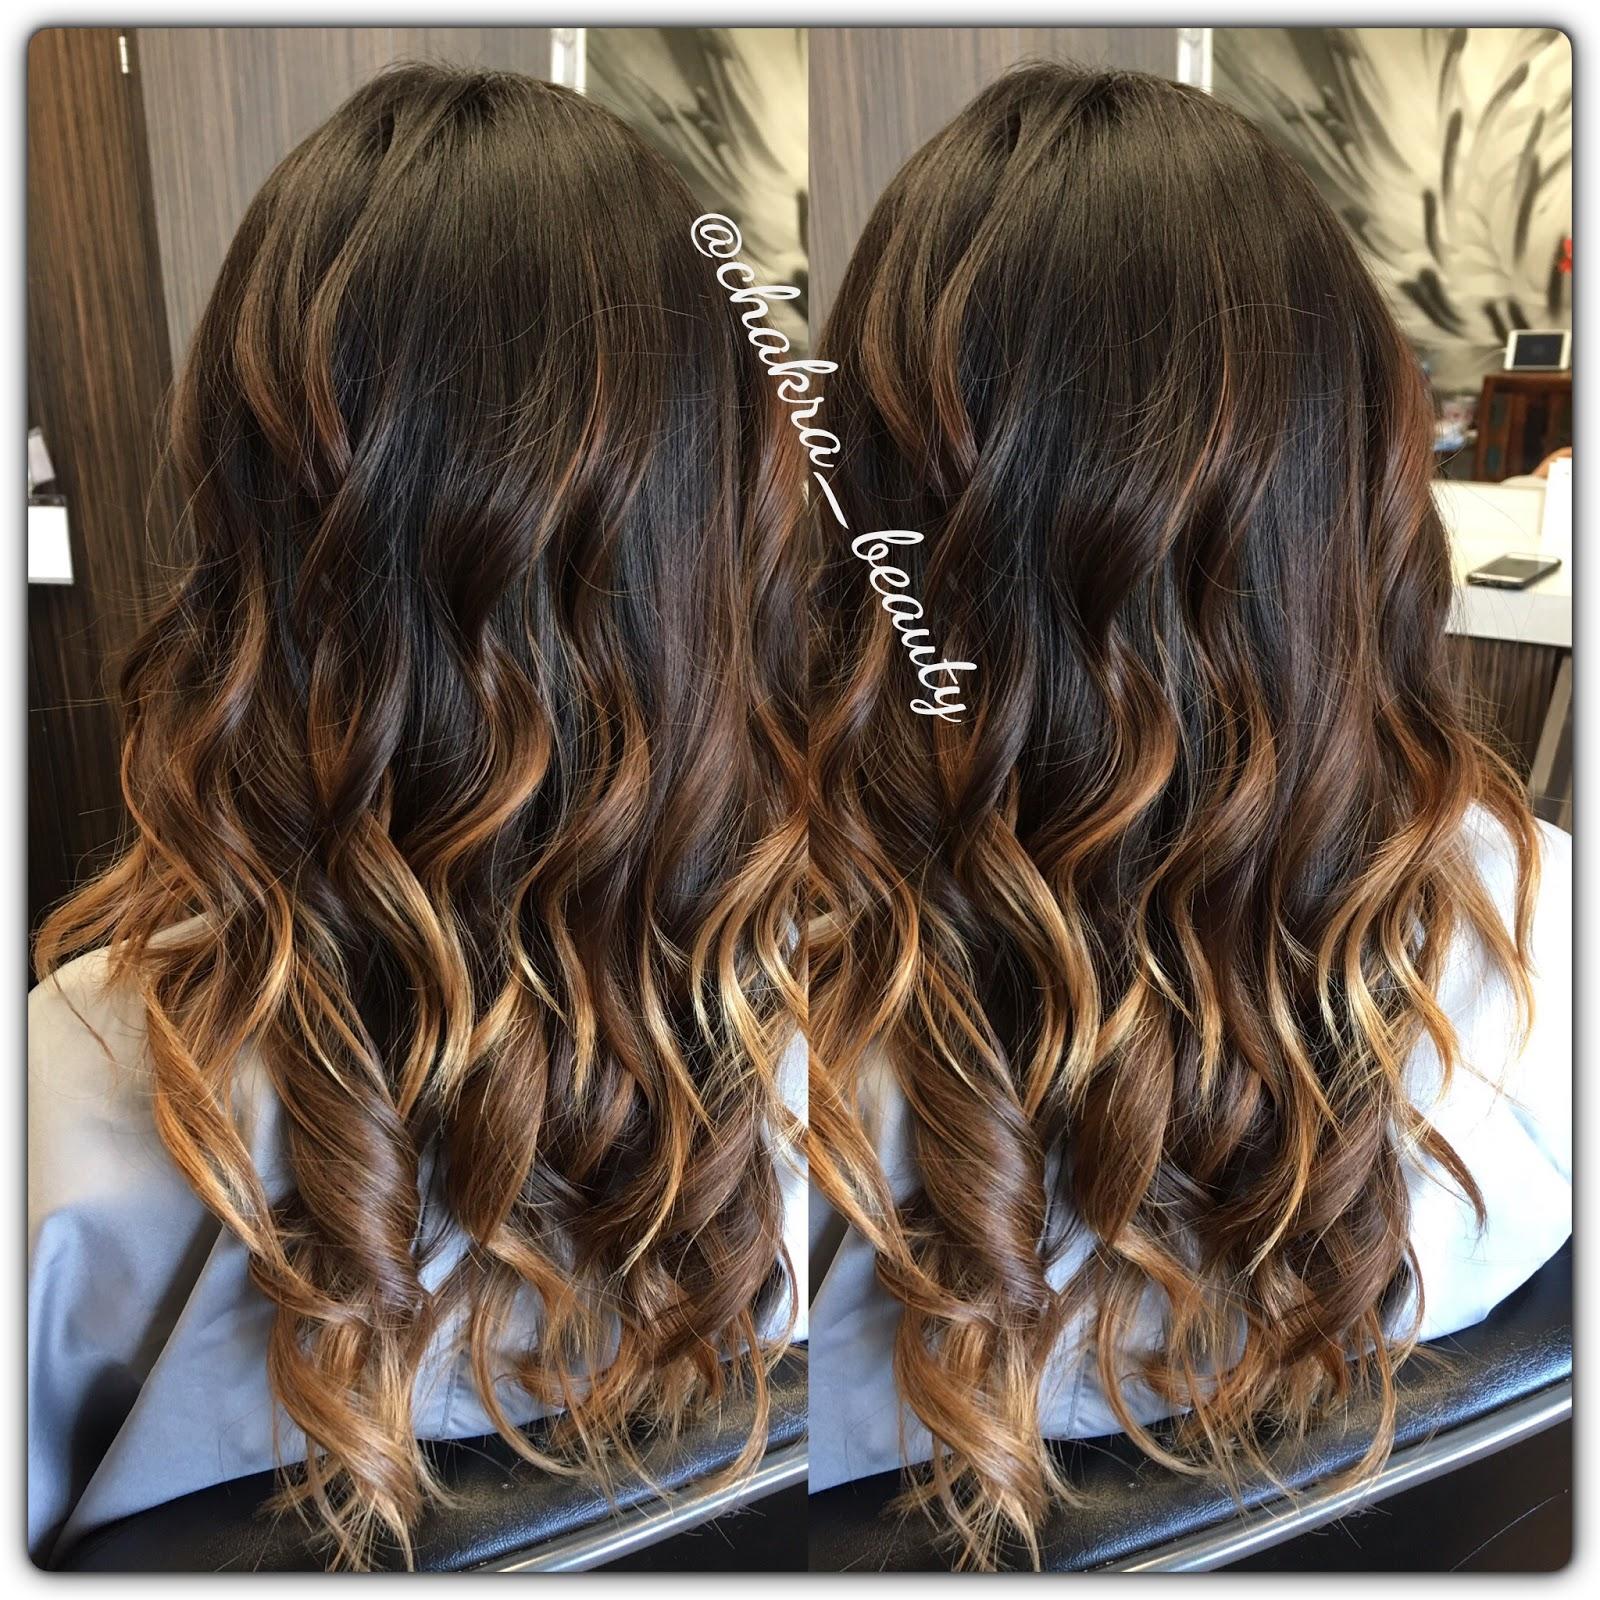 Hair Salon Encinitas